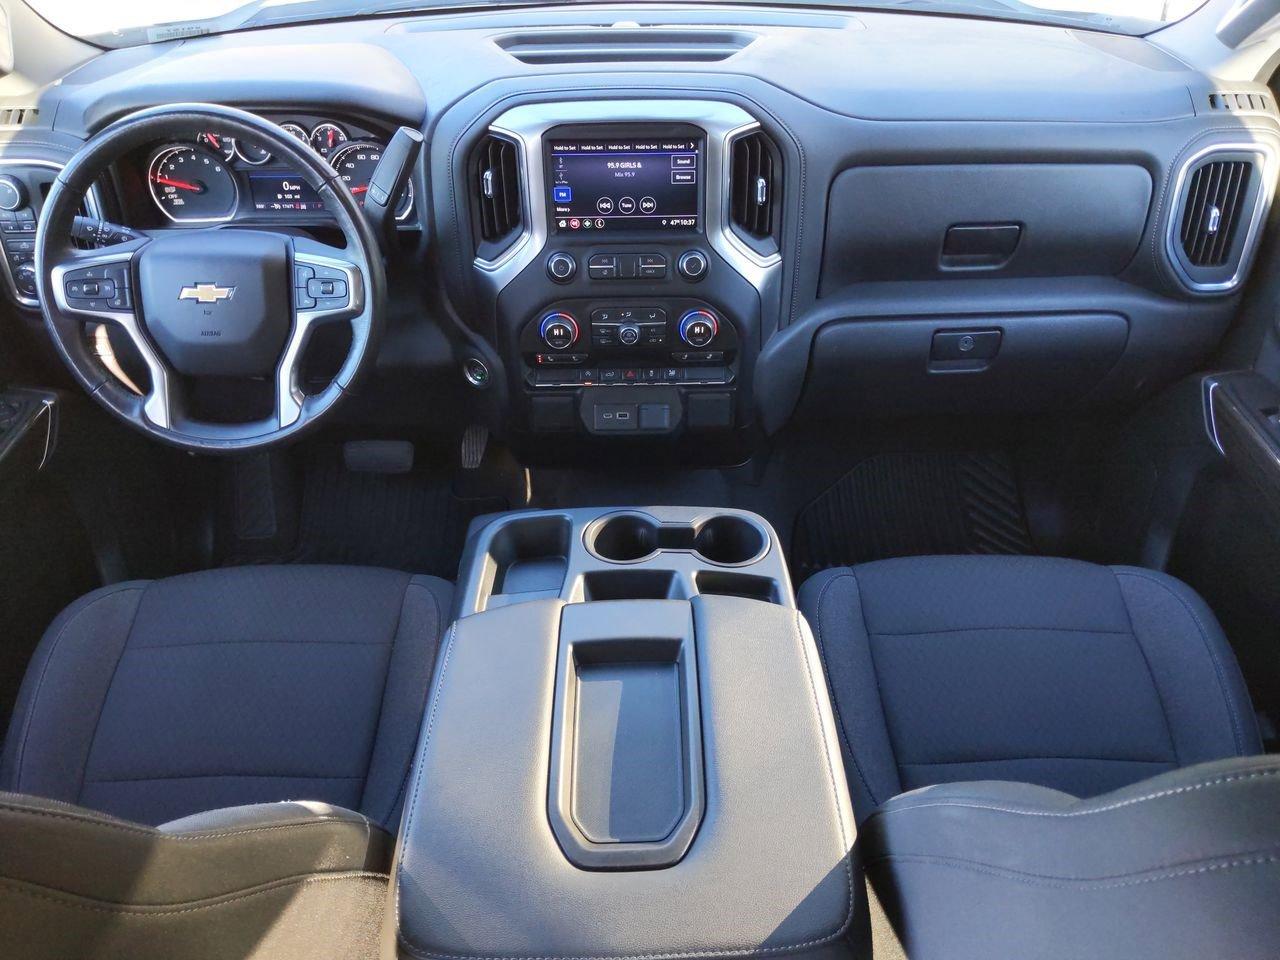 Certified Pre-Owned 2019 Chevrolet Silverado 1500 LT